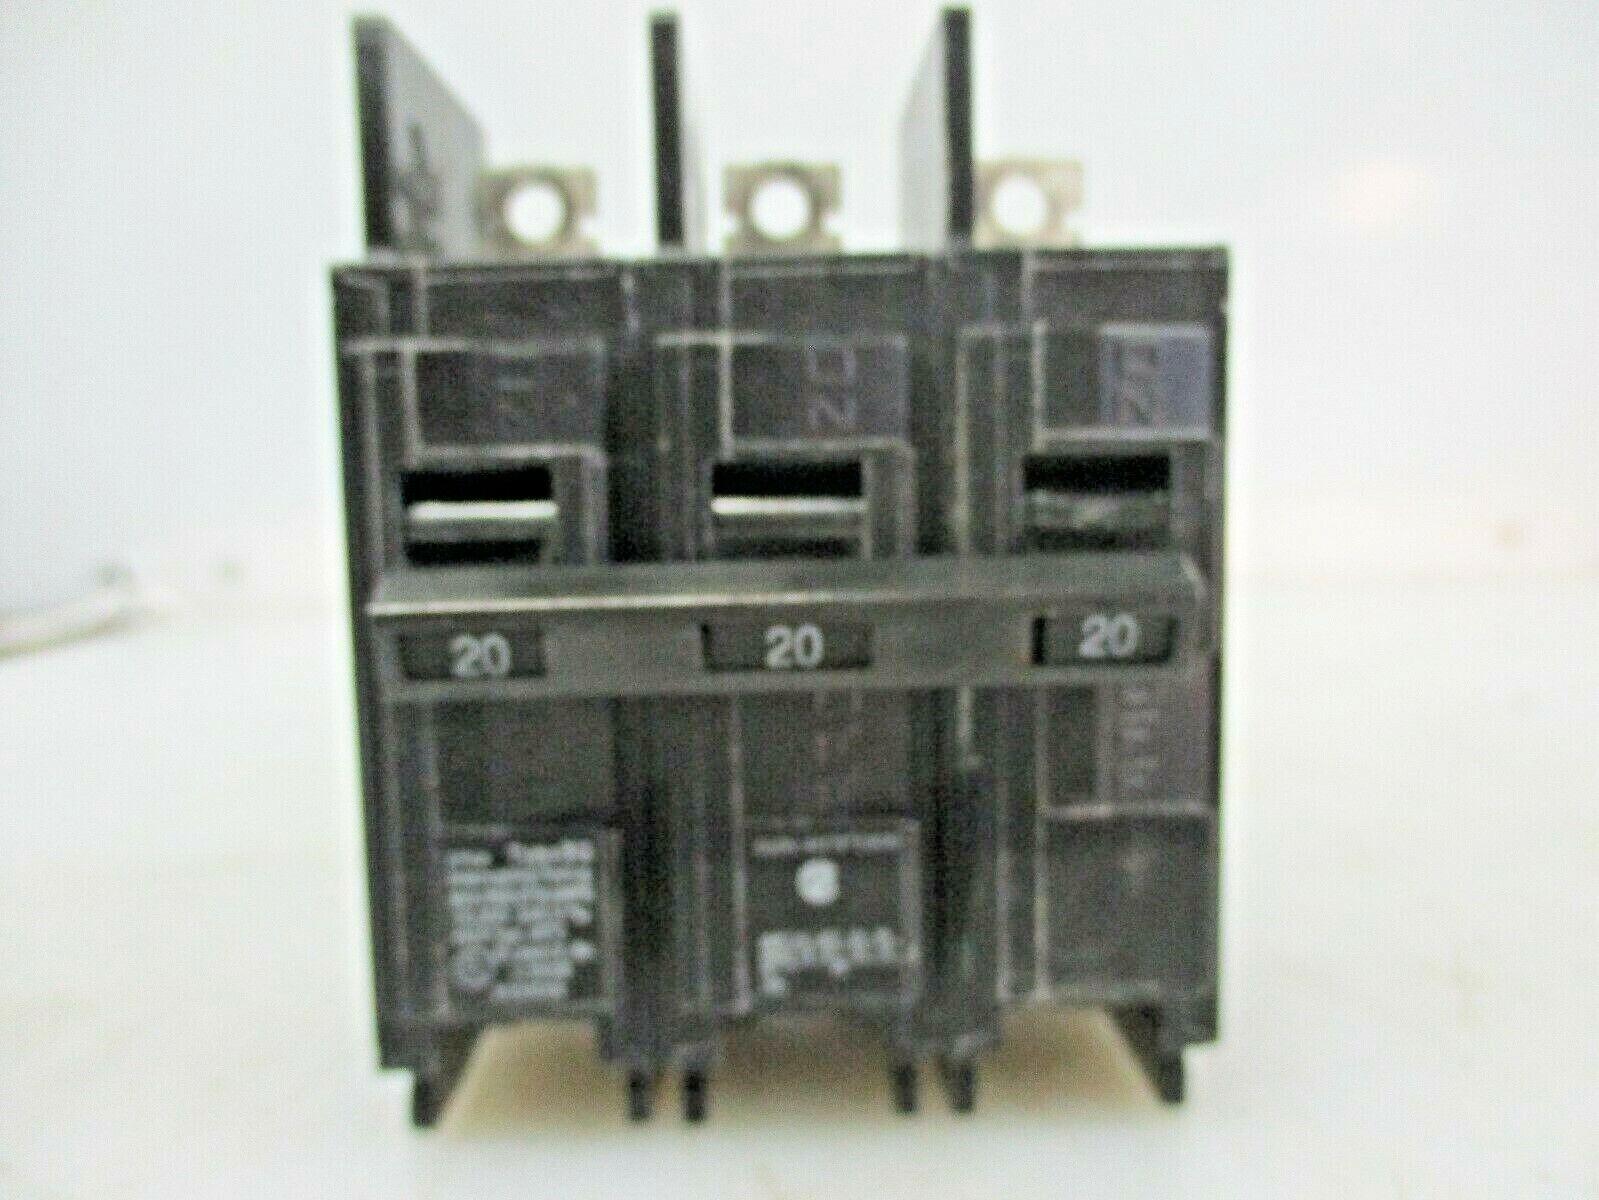 SIEMENS 3 POLE CIRCUIT BREAKER 20A BQ3B020 - $9.99